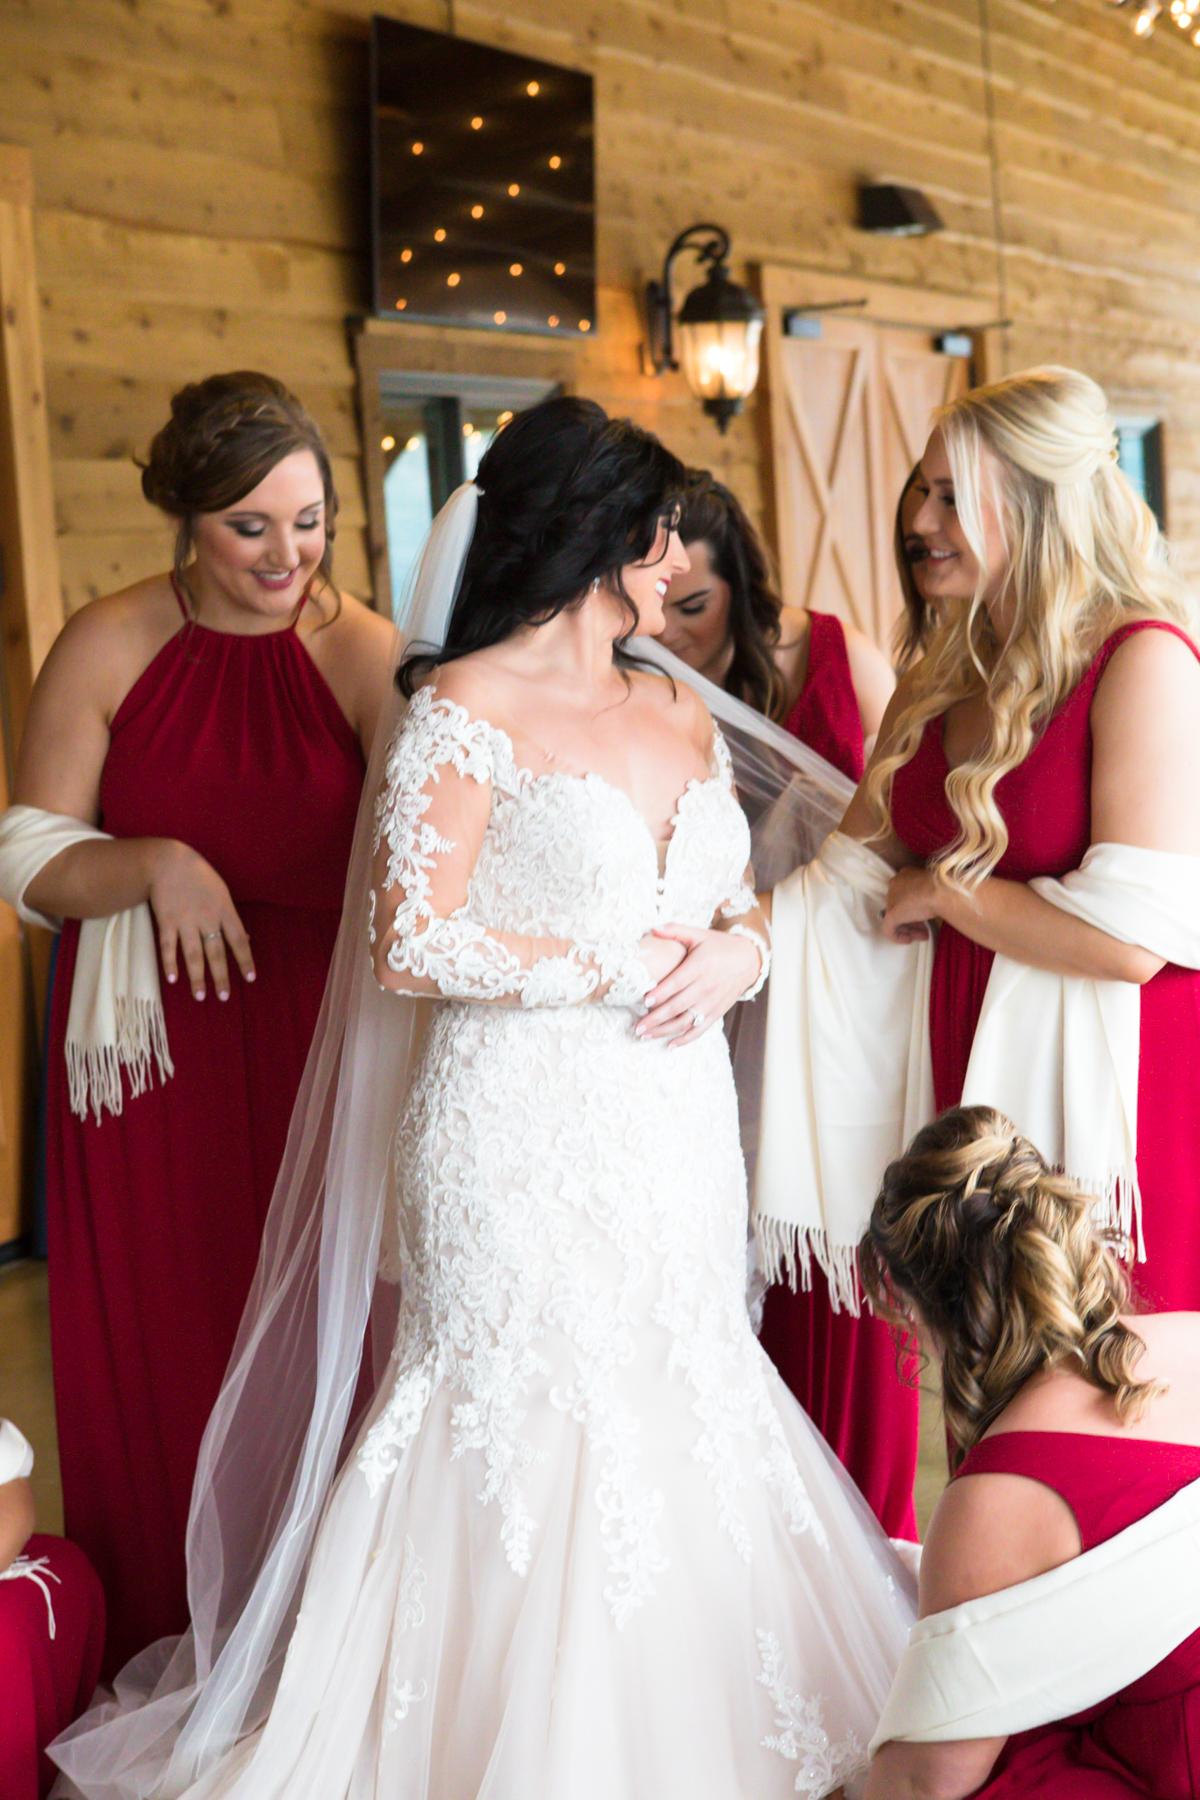 The-Barn-at-Sycamore-Farms-wedding-Shawn-and-Hayden-0119.jpg